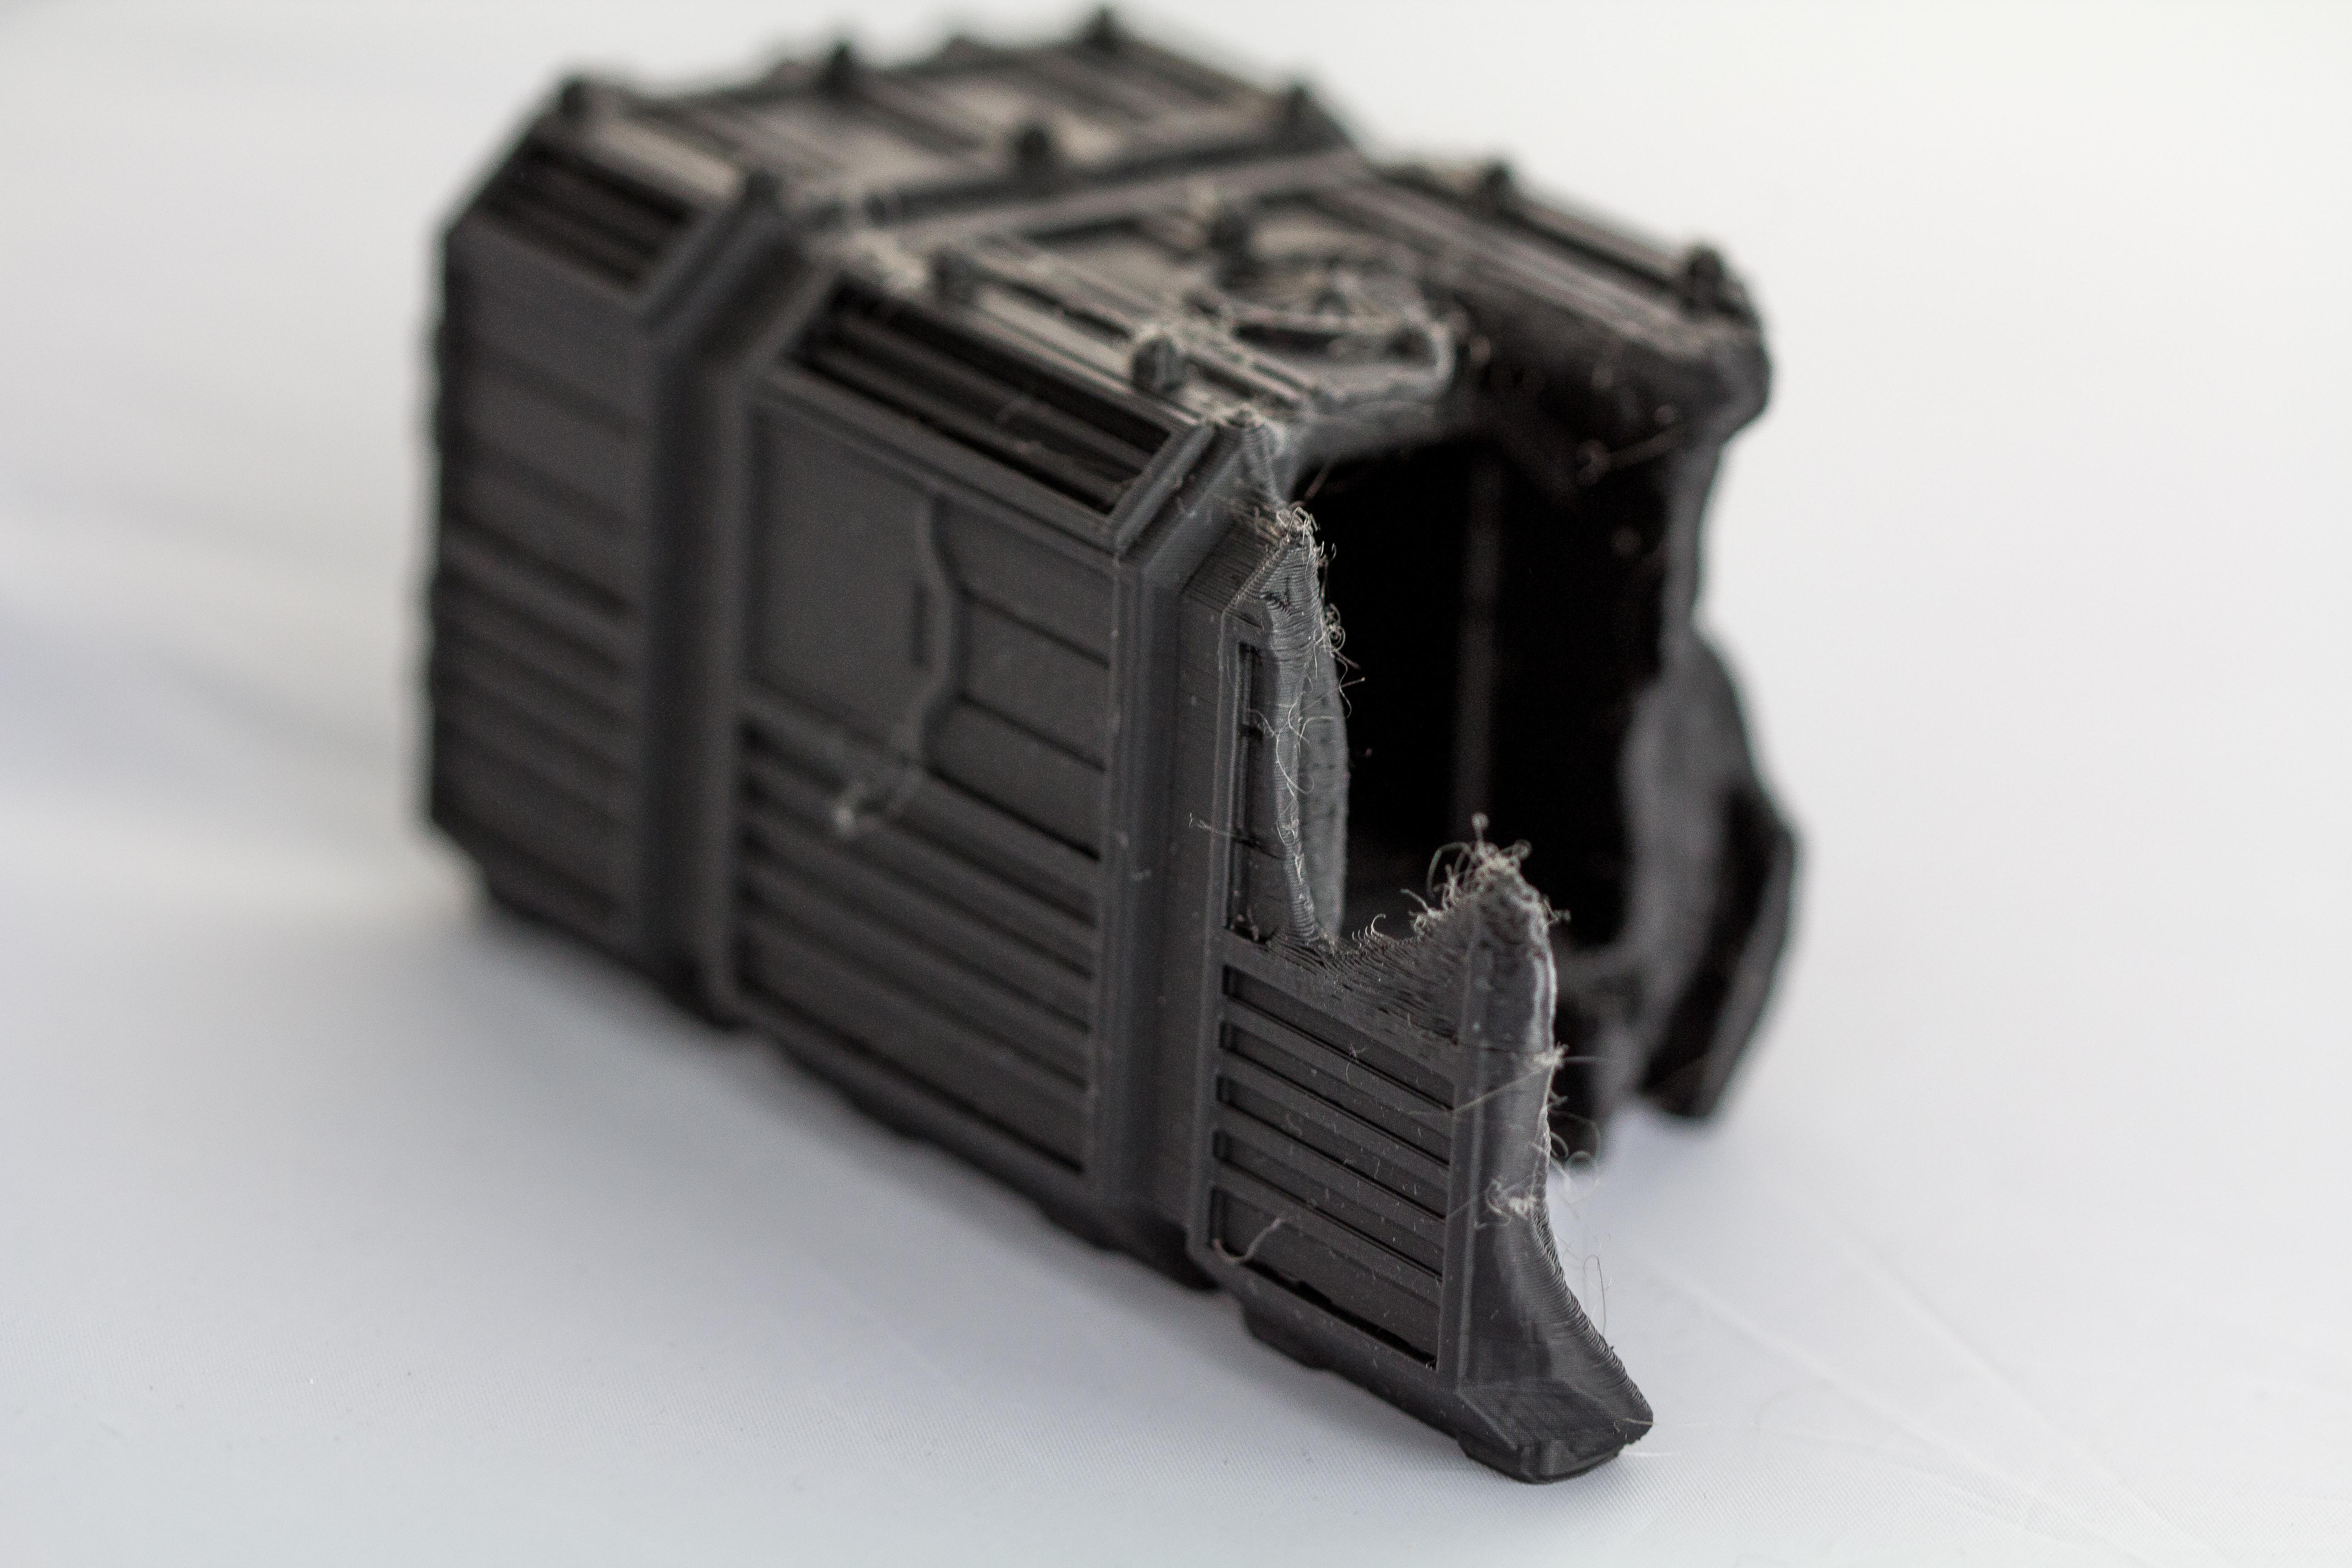 Wargame terrain - printed CR10s (1 of 10)